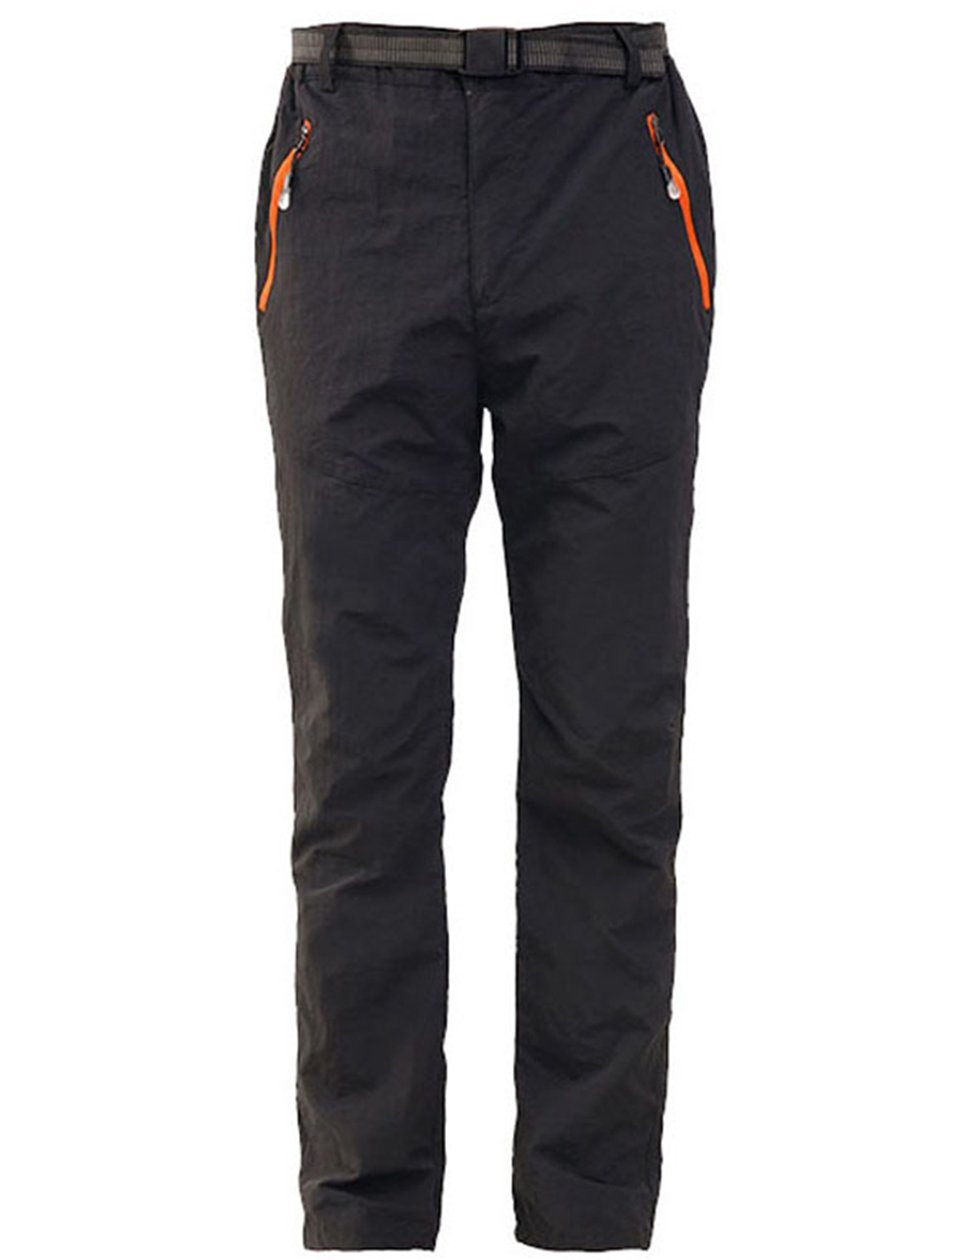 b5aa540ce40 Lakaka Hiking Trousers Womens Summer Outdoor Waterproof Breathable Quick  Drying Anti-UV Thin Pants Sportswear  Amazon.co.uk  Sports   Outdoors